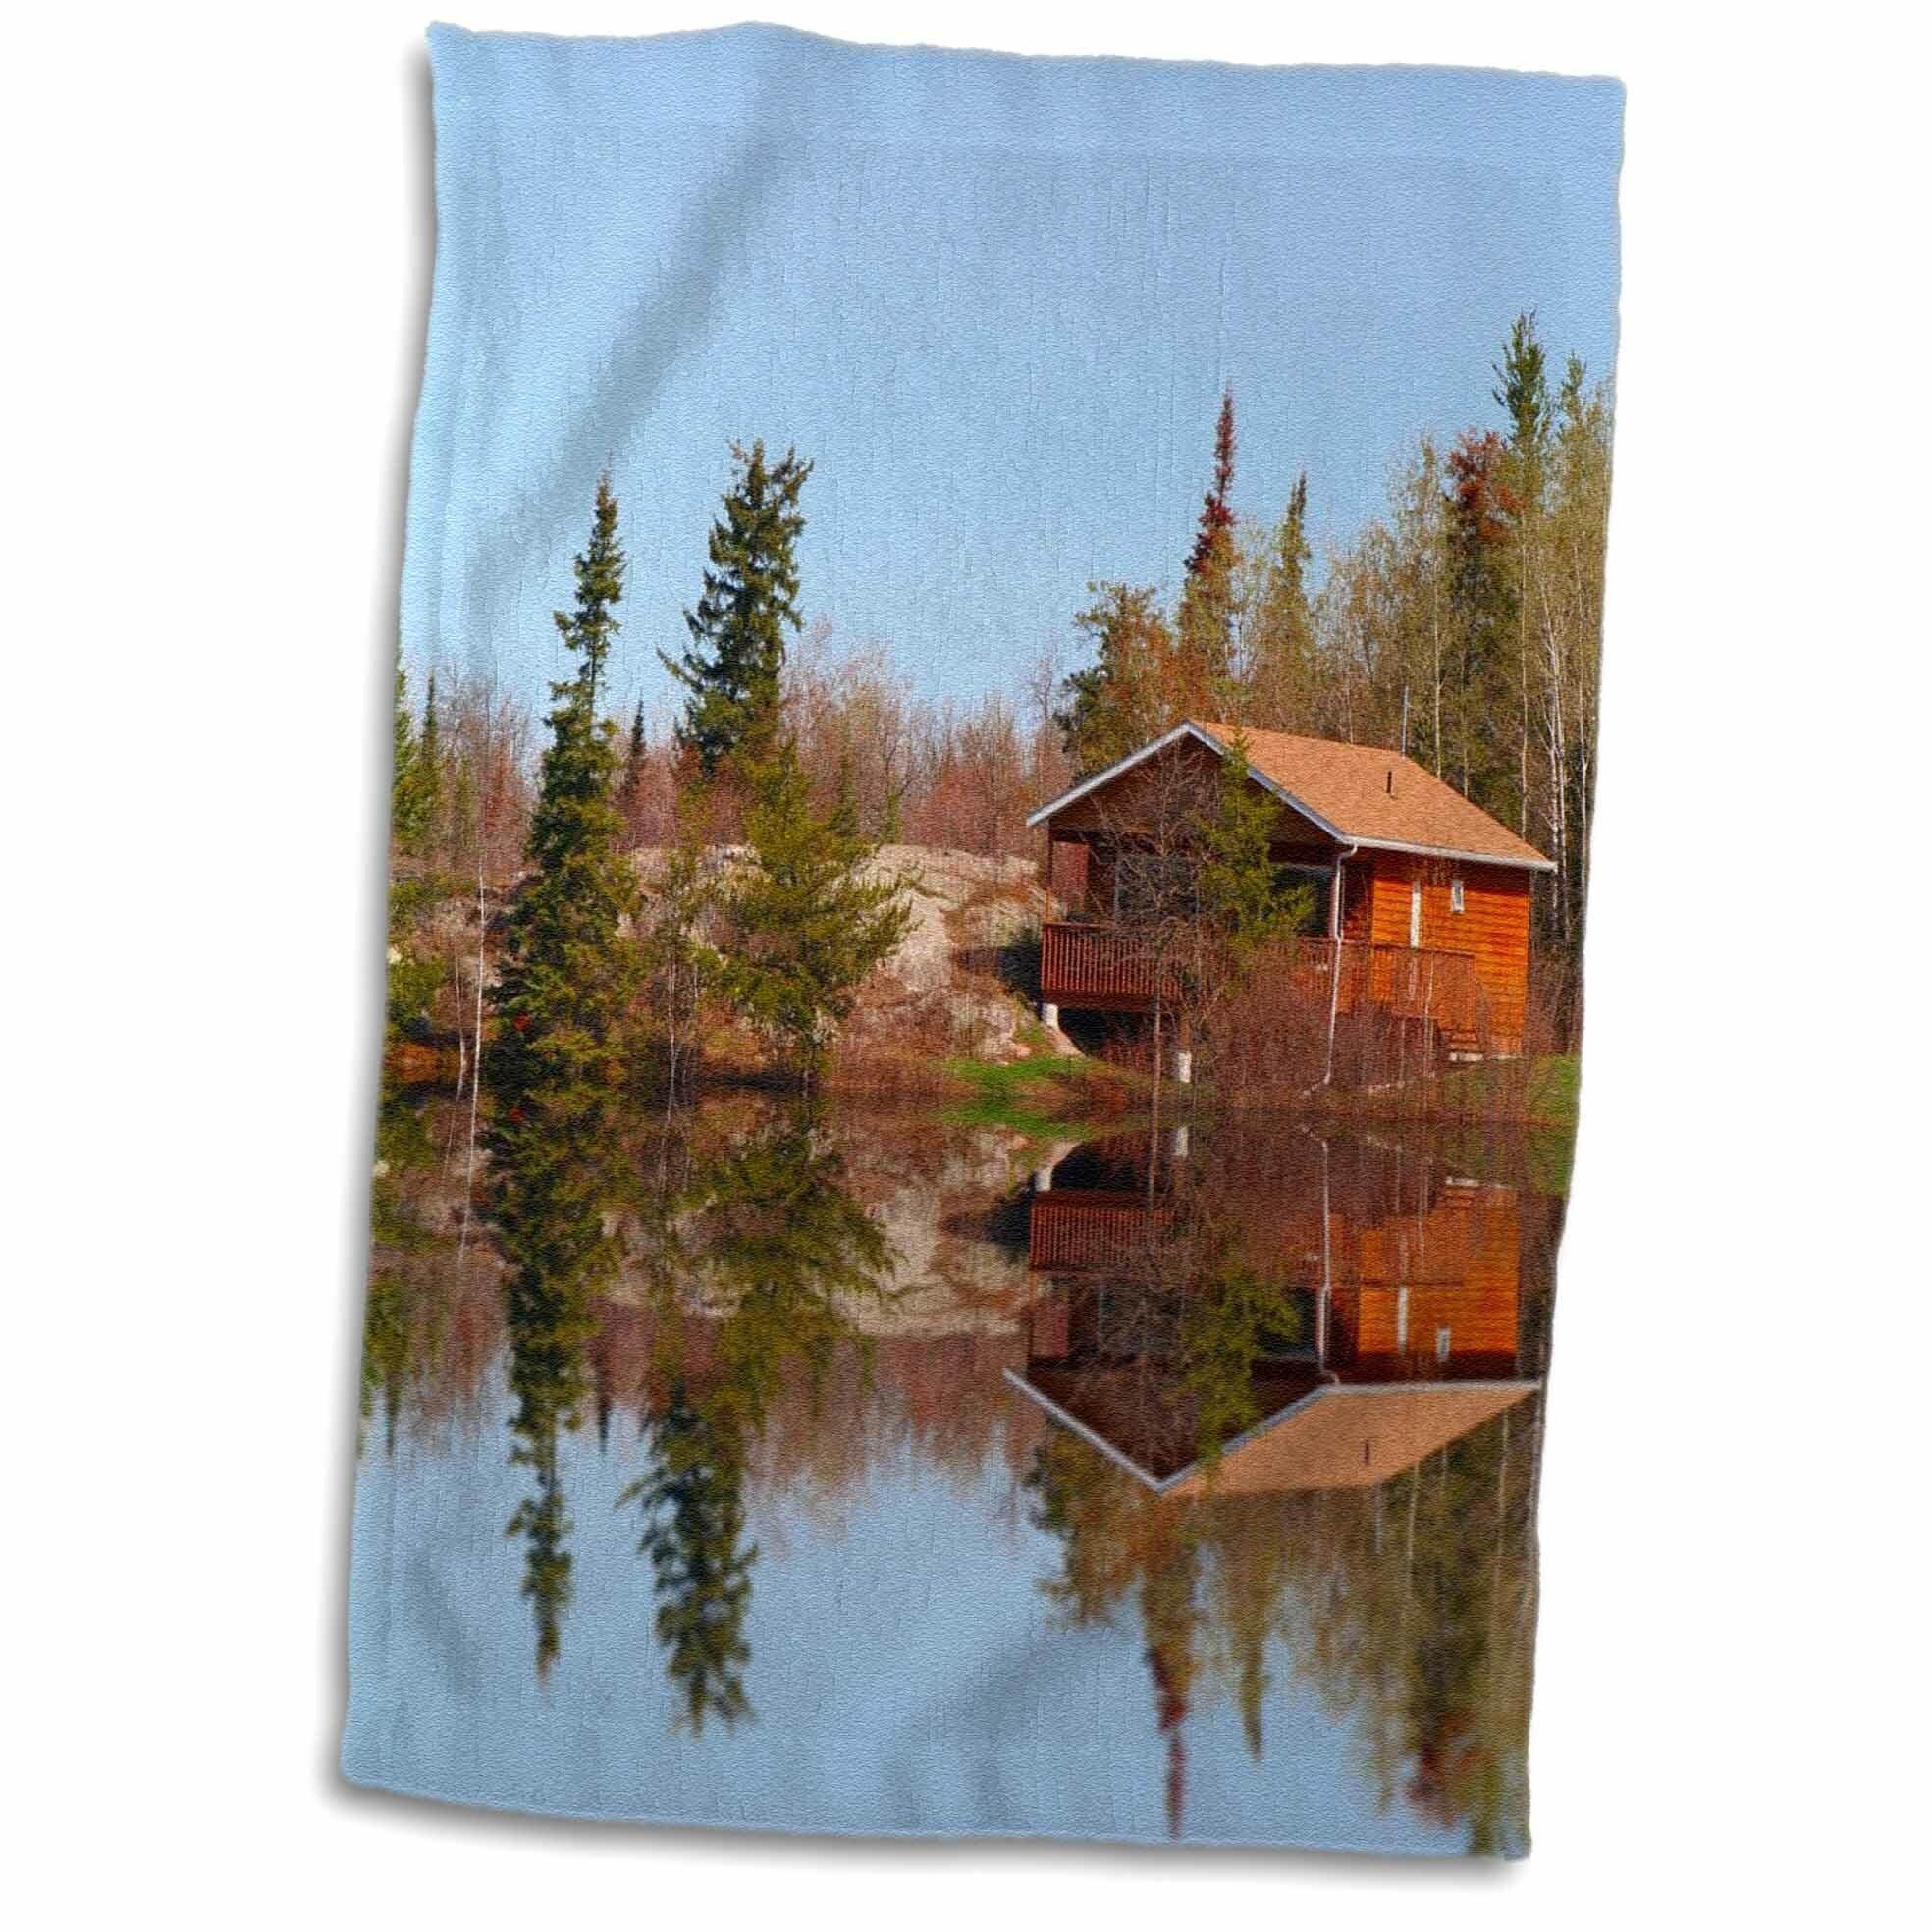 Symple Stuff Rustic Cabin Reflections Towel Wayfair